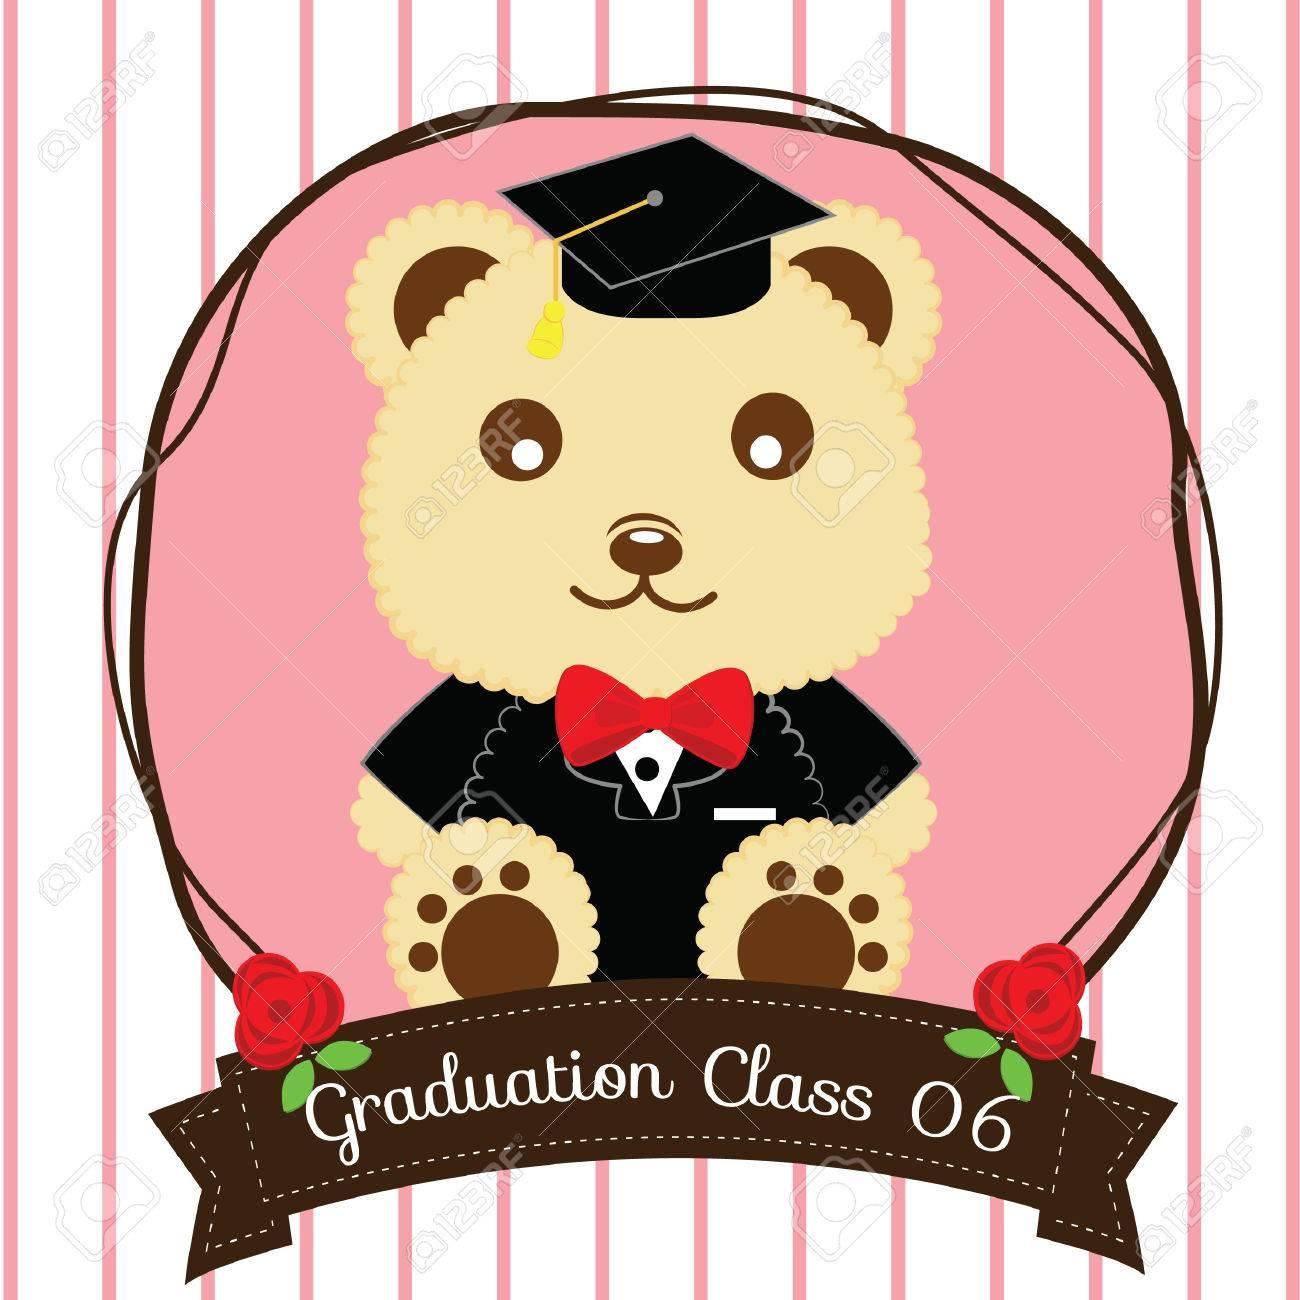 graduation banner - 52661927